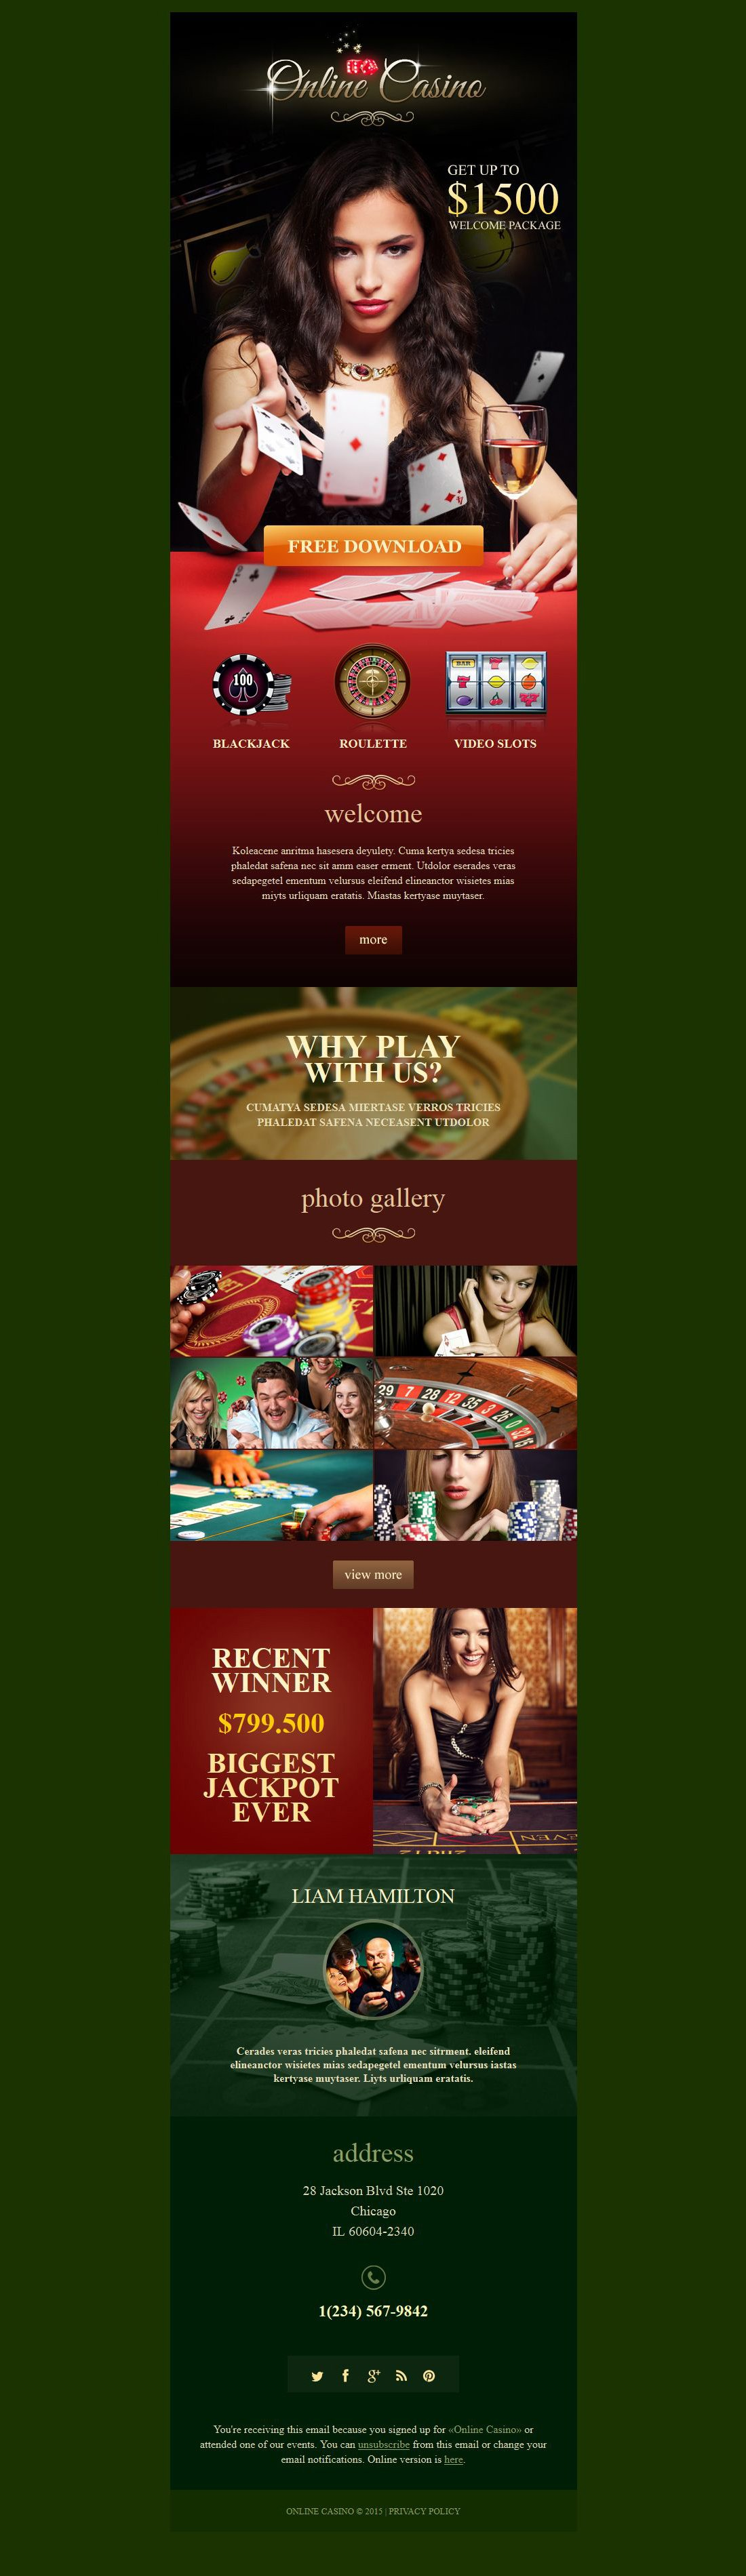 online casino responsive newsletter template 53030